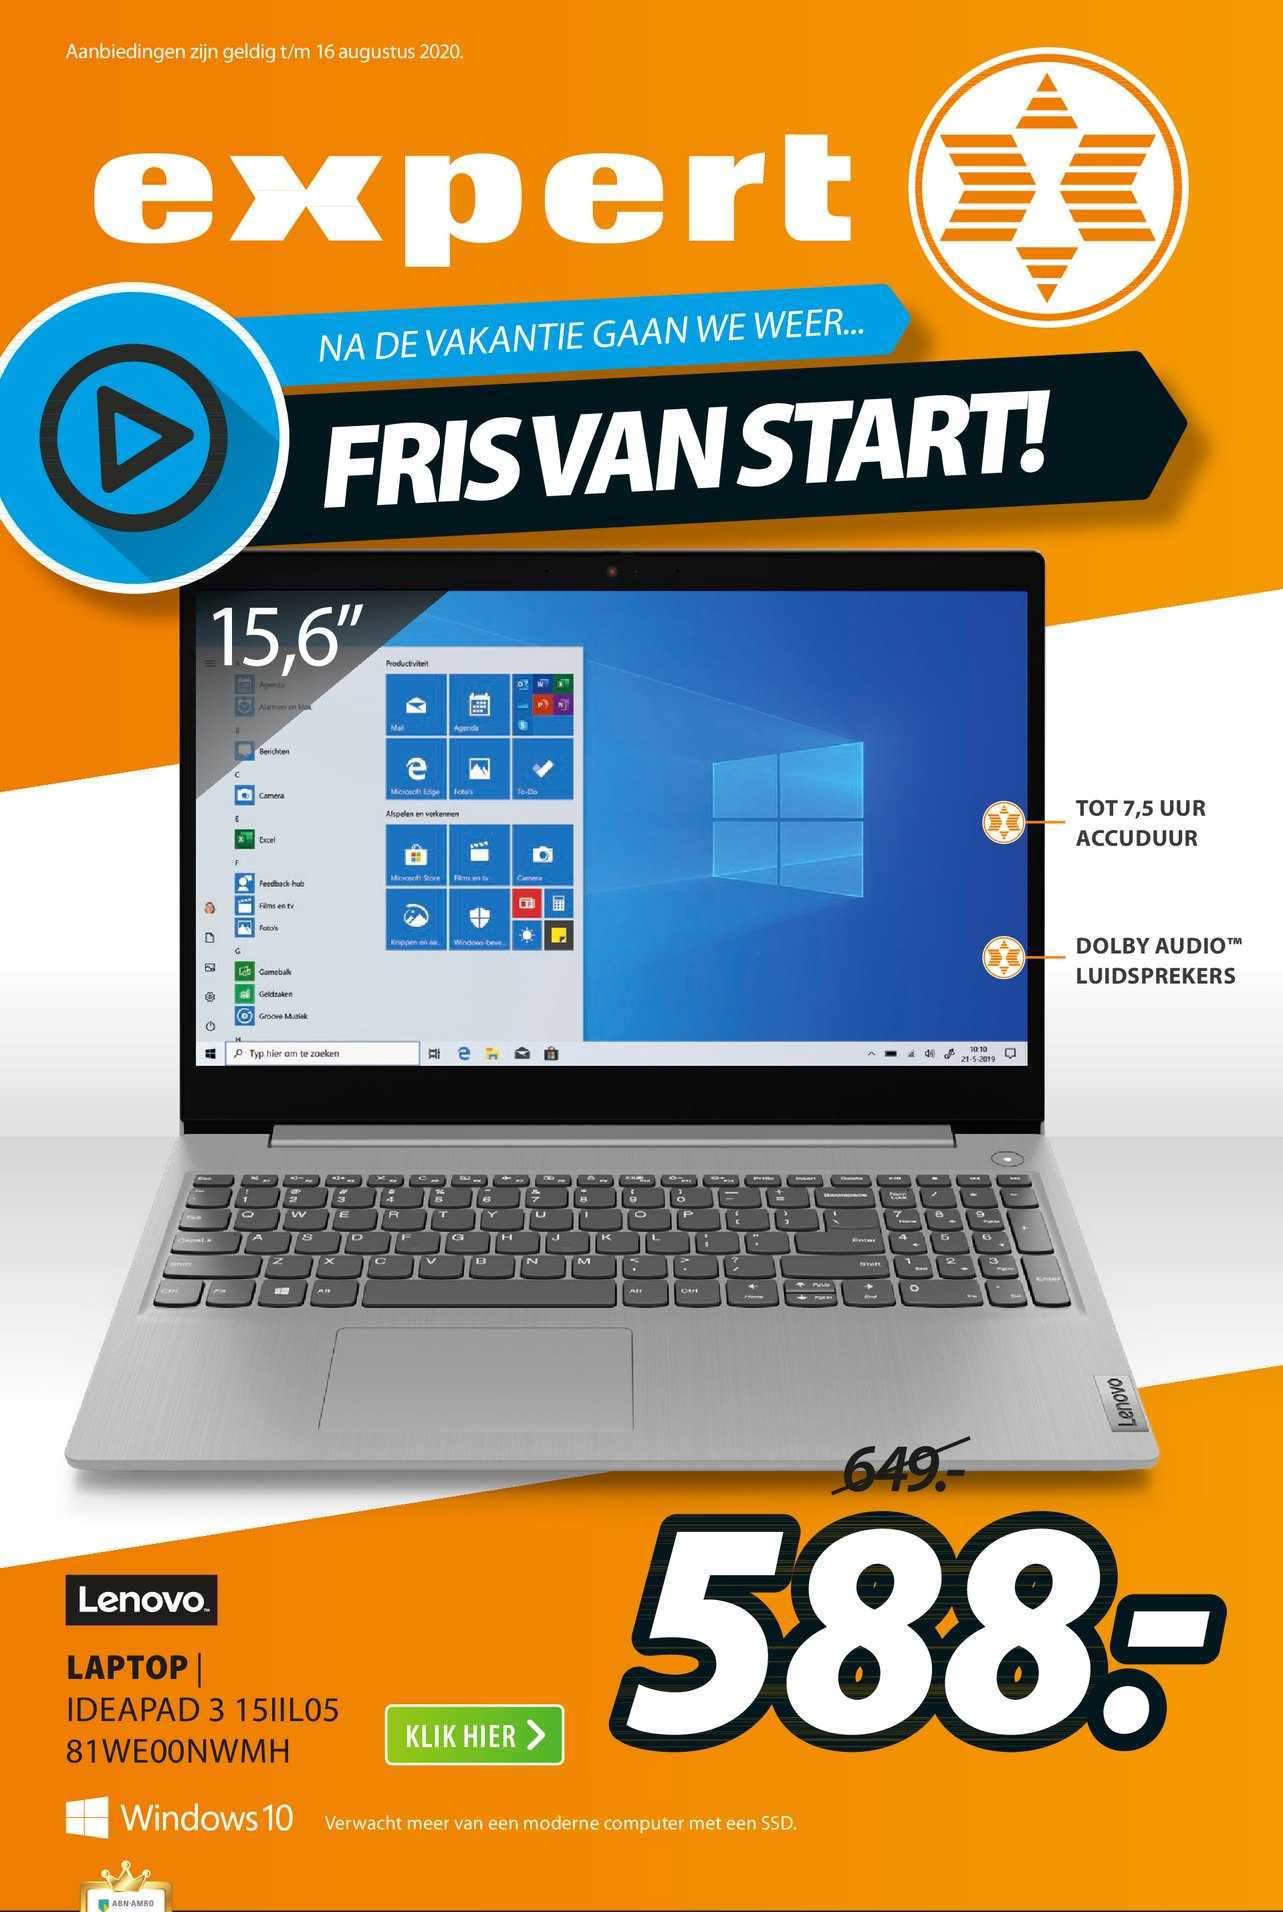 Expert Lenovo Laptop | Ideapad 3 15IIL05 81WE00NWMH